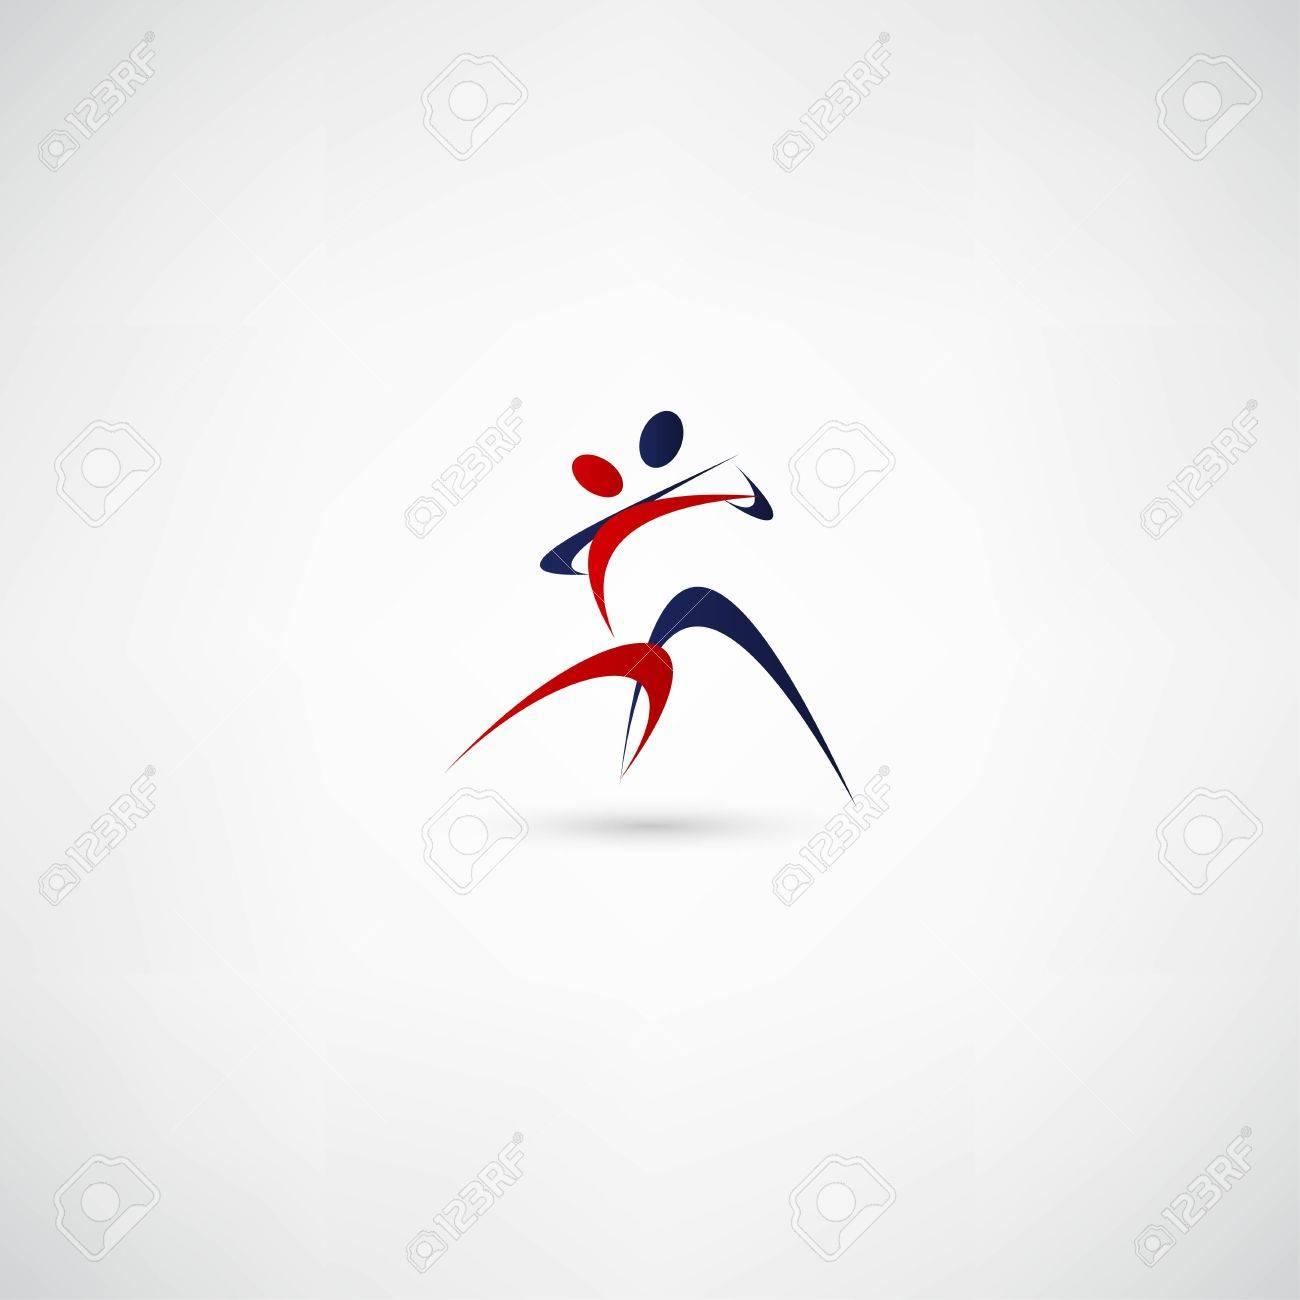 dancer icon Stock Vector - 21993453